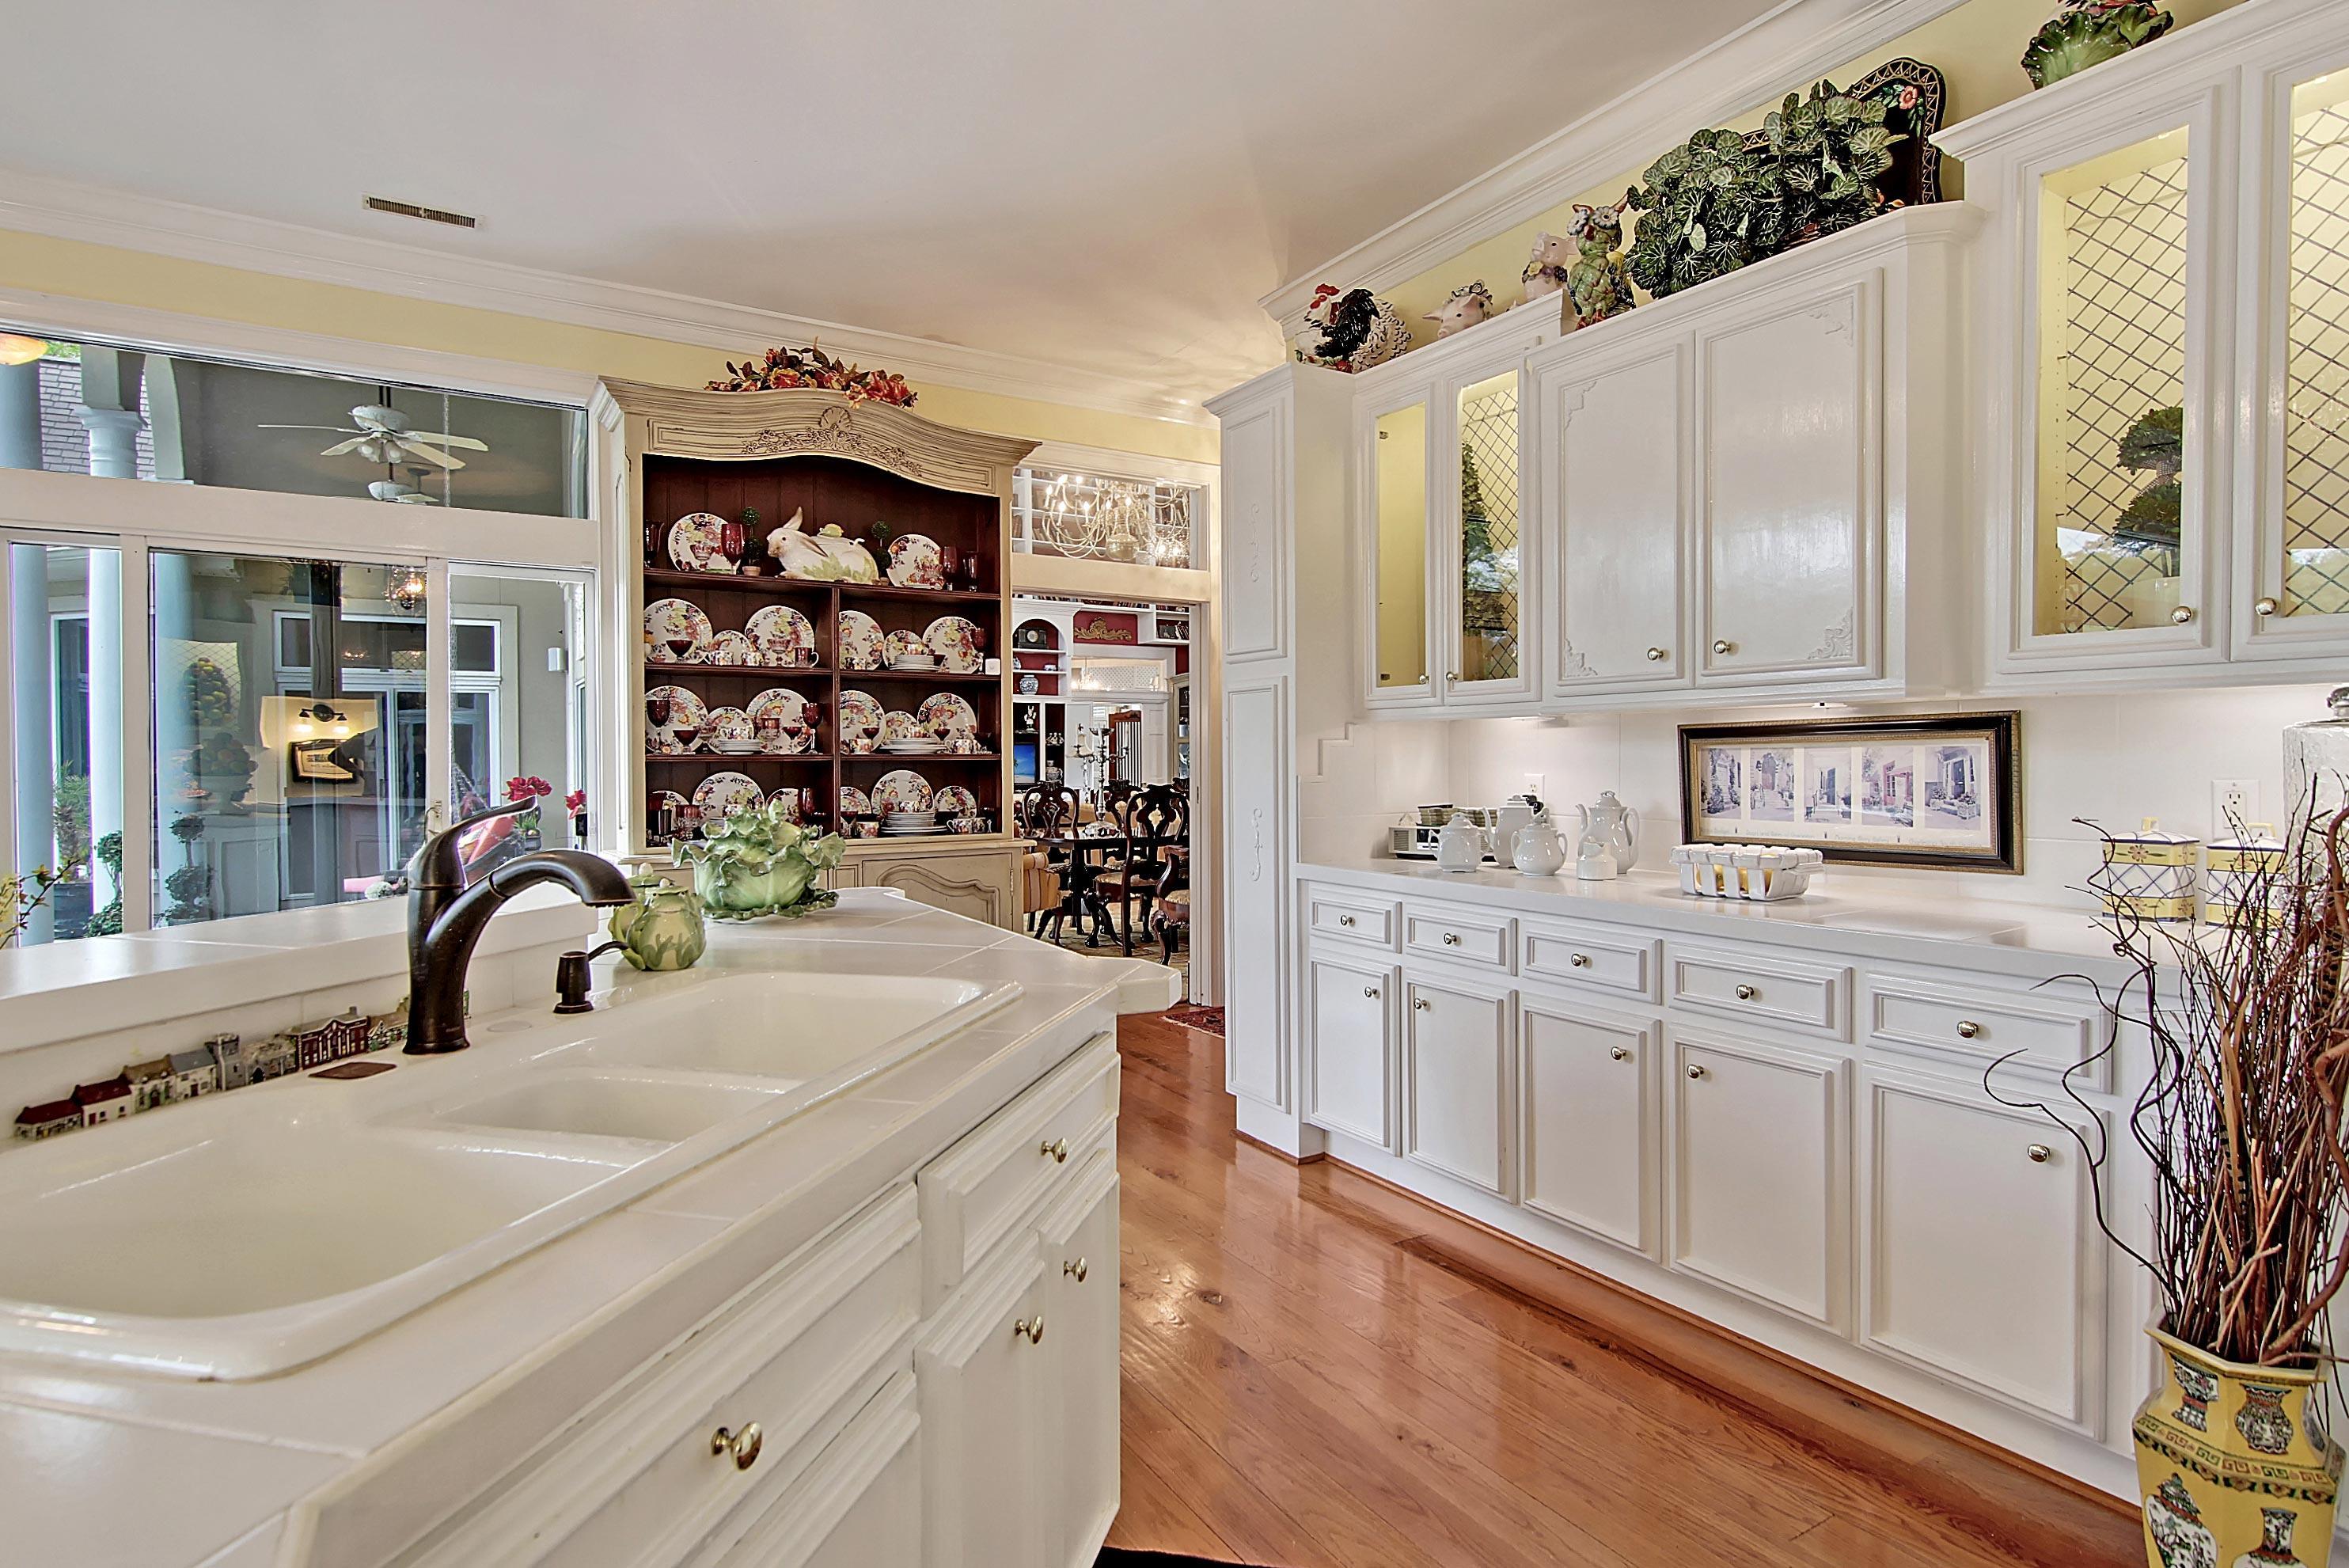 Edgewater Park Homes For Sale - 1323 Edgewater, Charleston, SC - 33